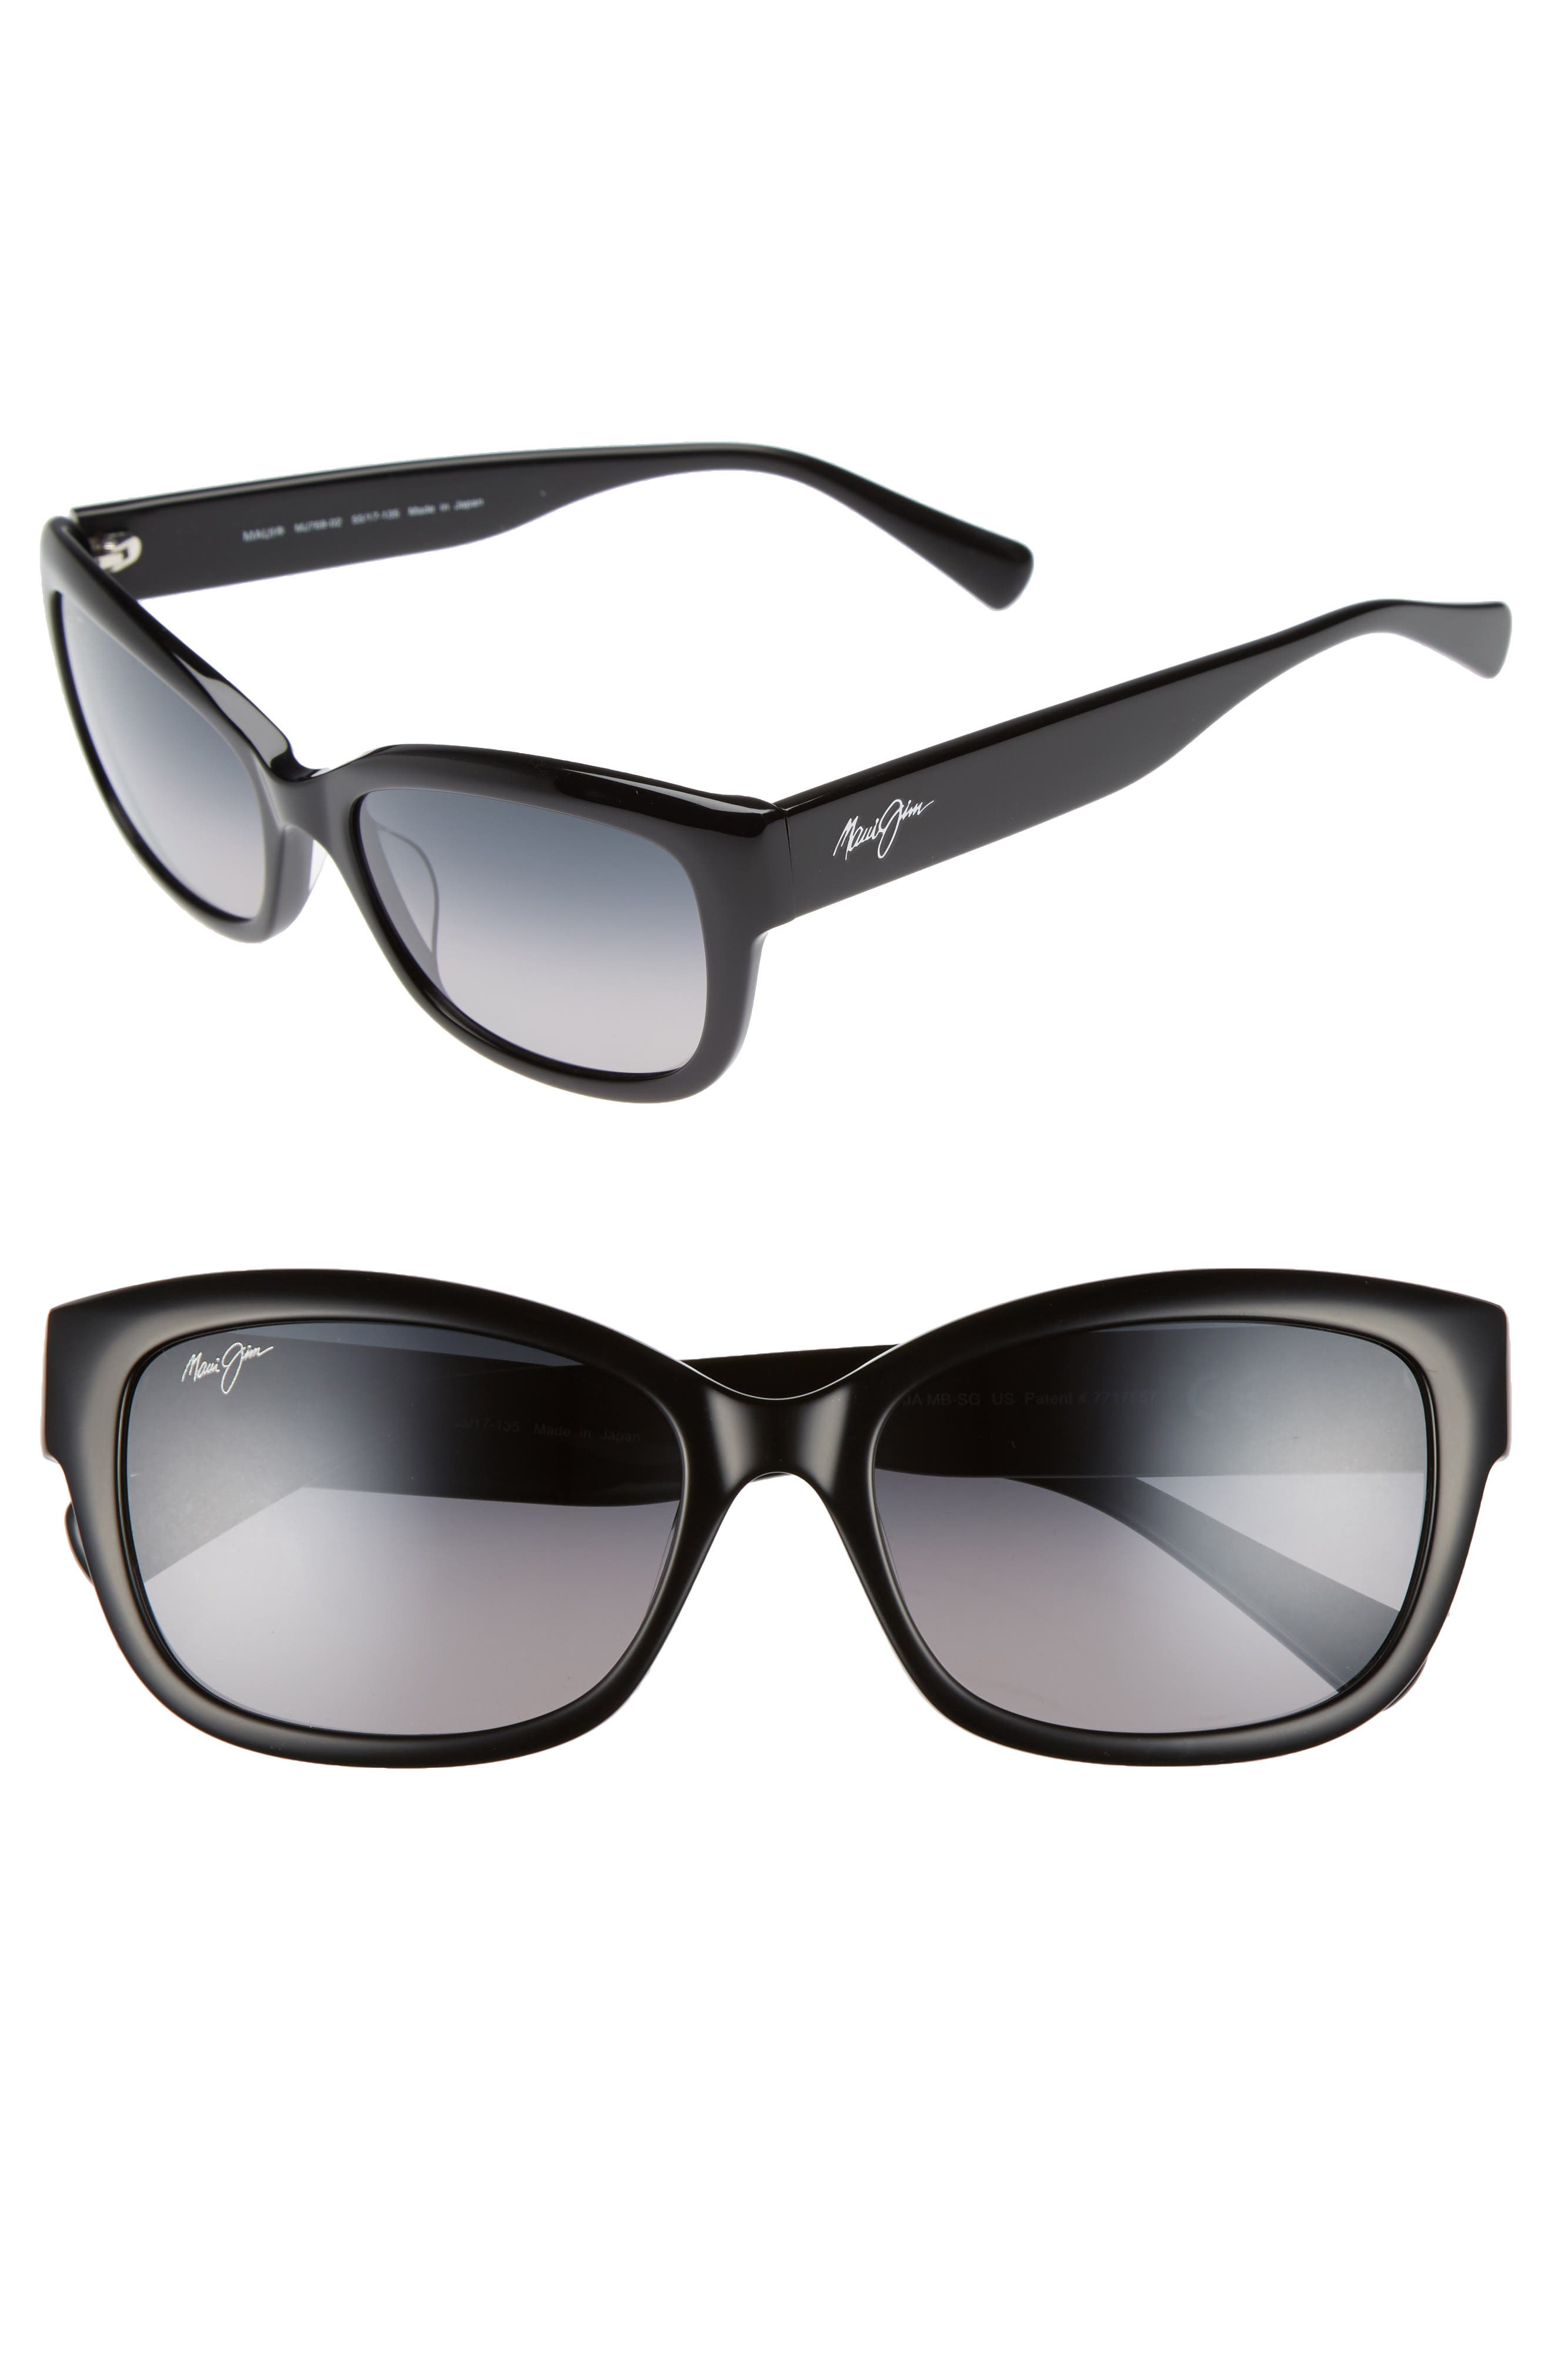 Plumeria 55mm Polarized Cat Eye Sunglasses,                         Main,                         color, Gloss Black/ Neutral Grey